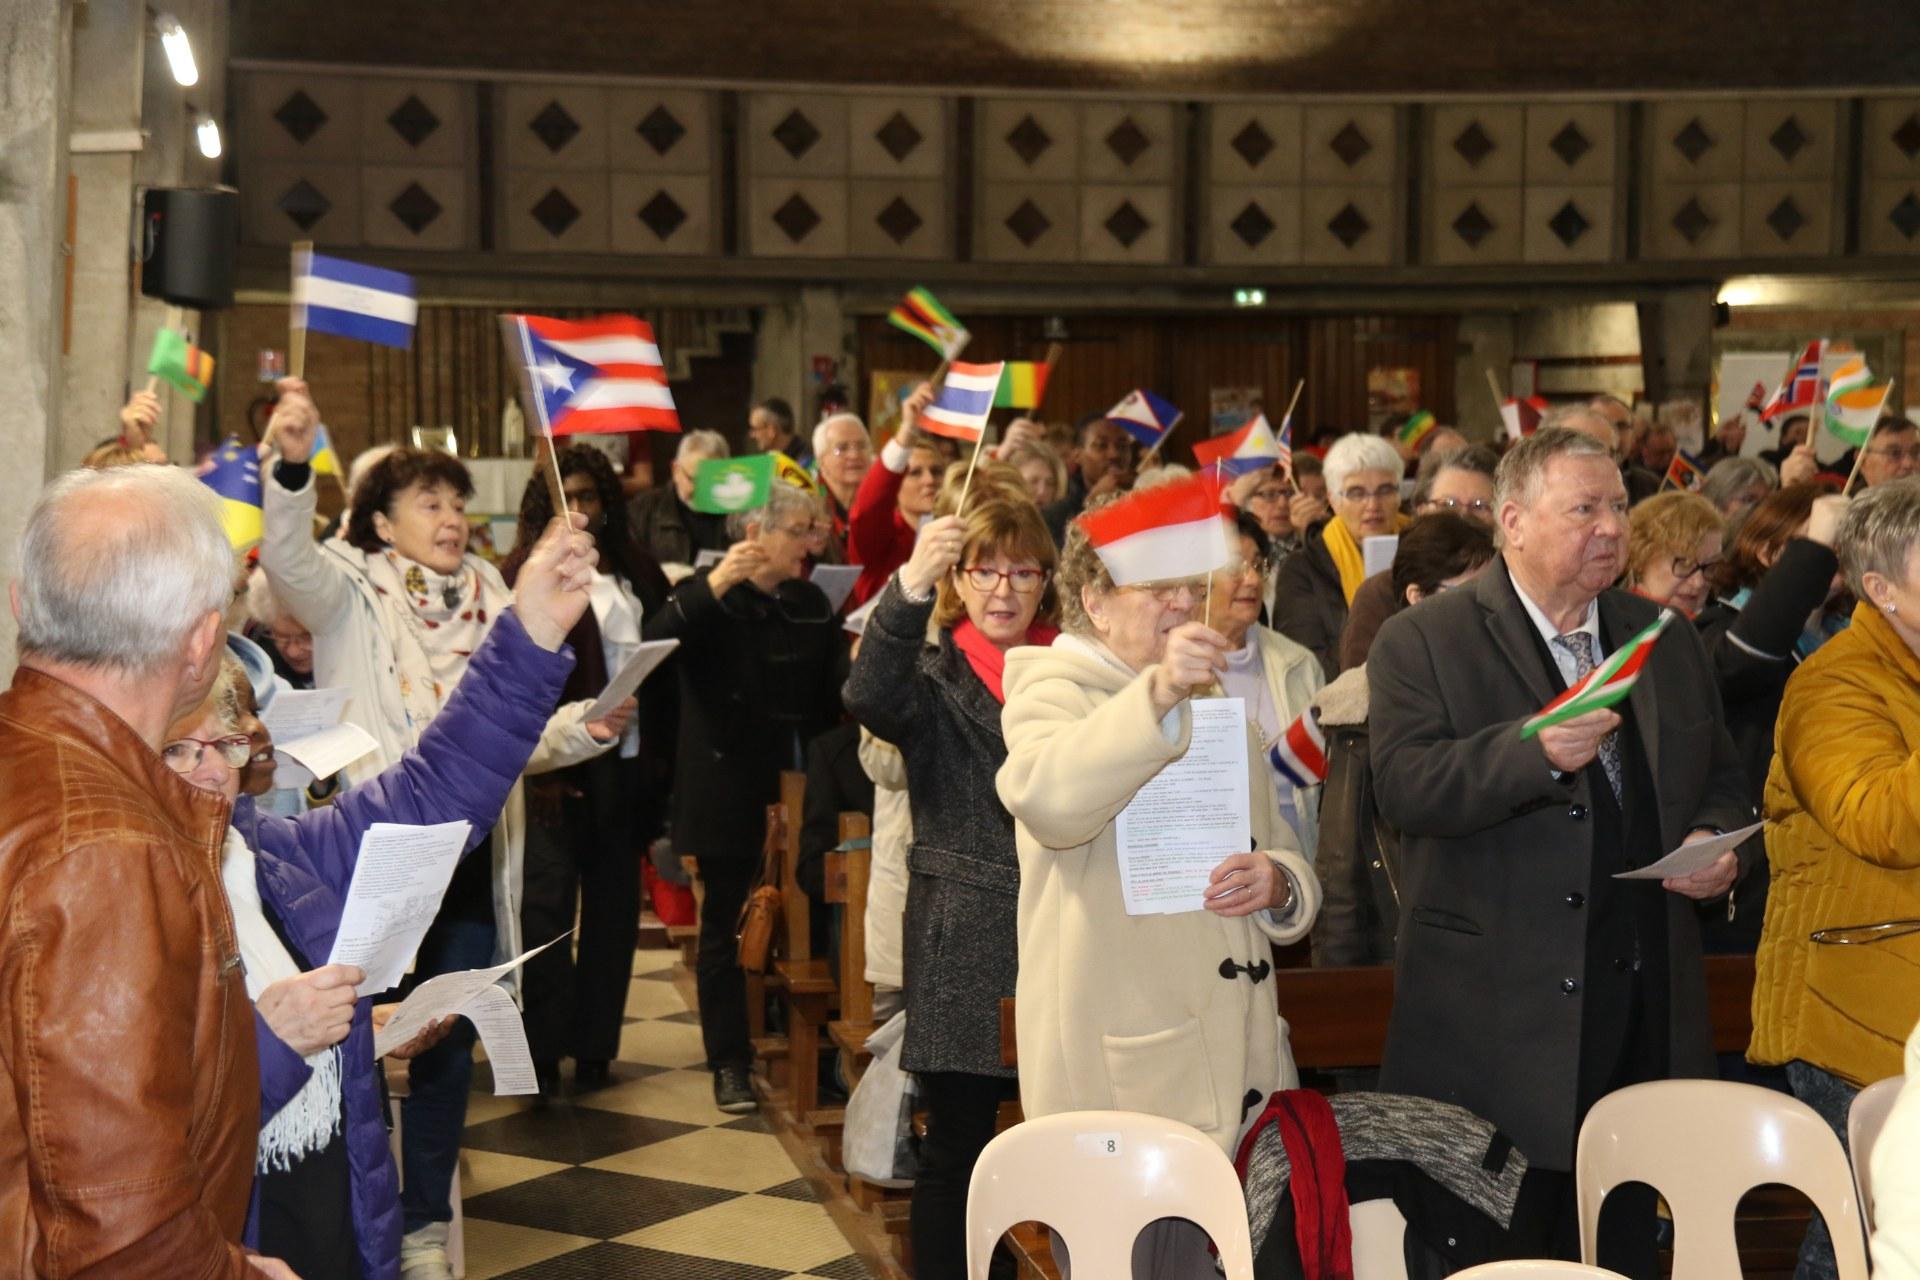 Messe des Nations 73